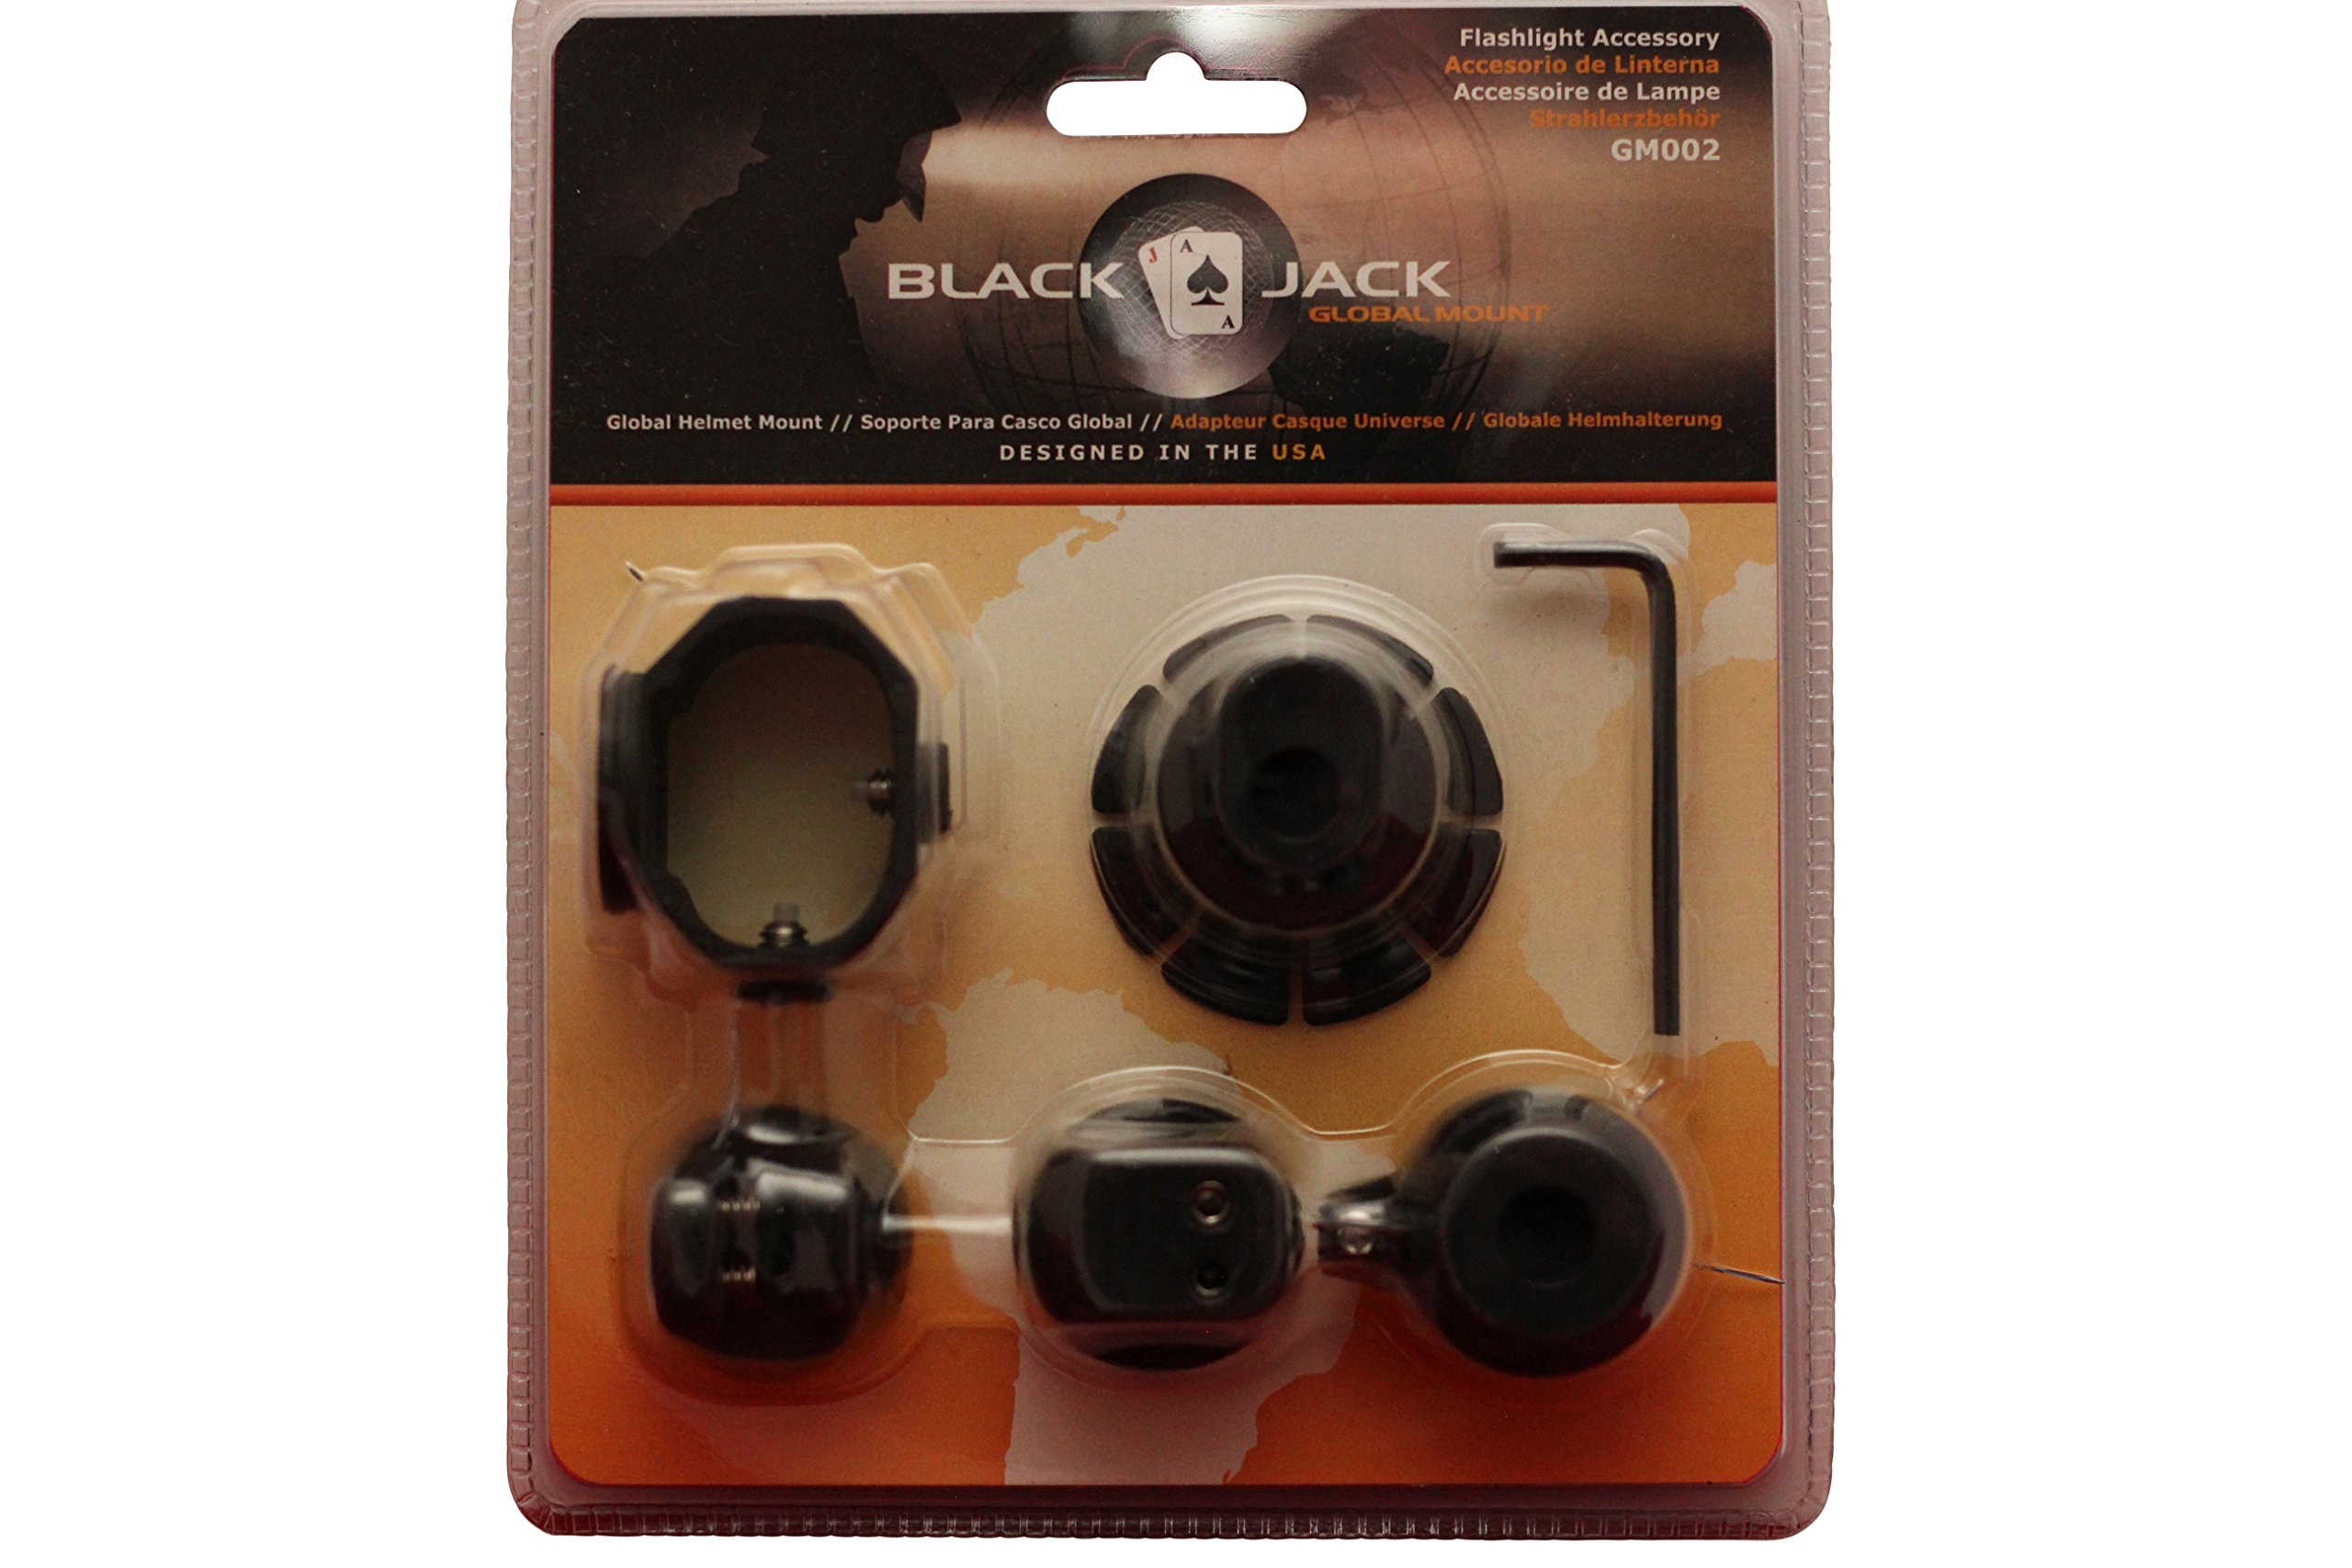 Blackjack Global Mount Firefighter Helmet Flashlight System